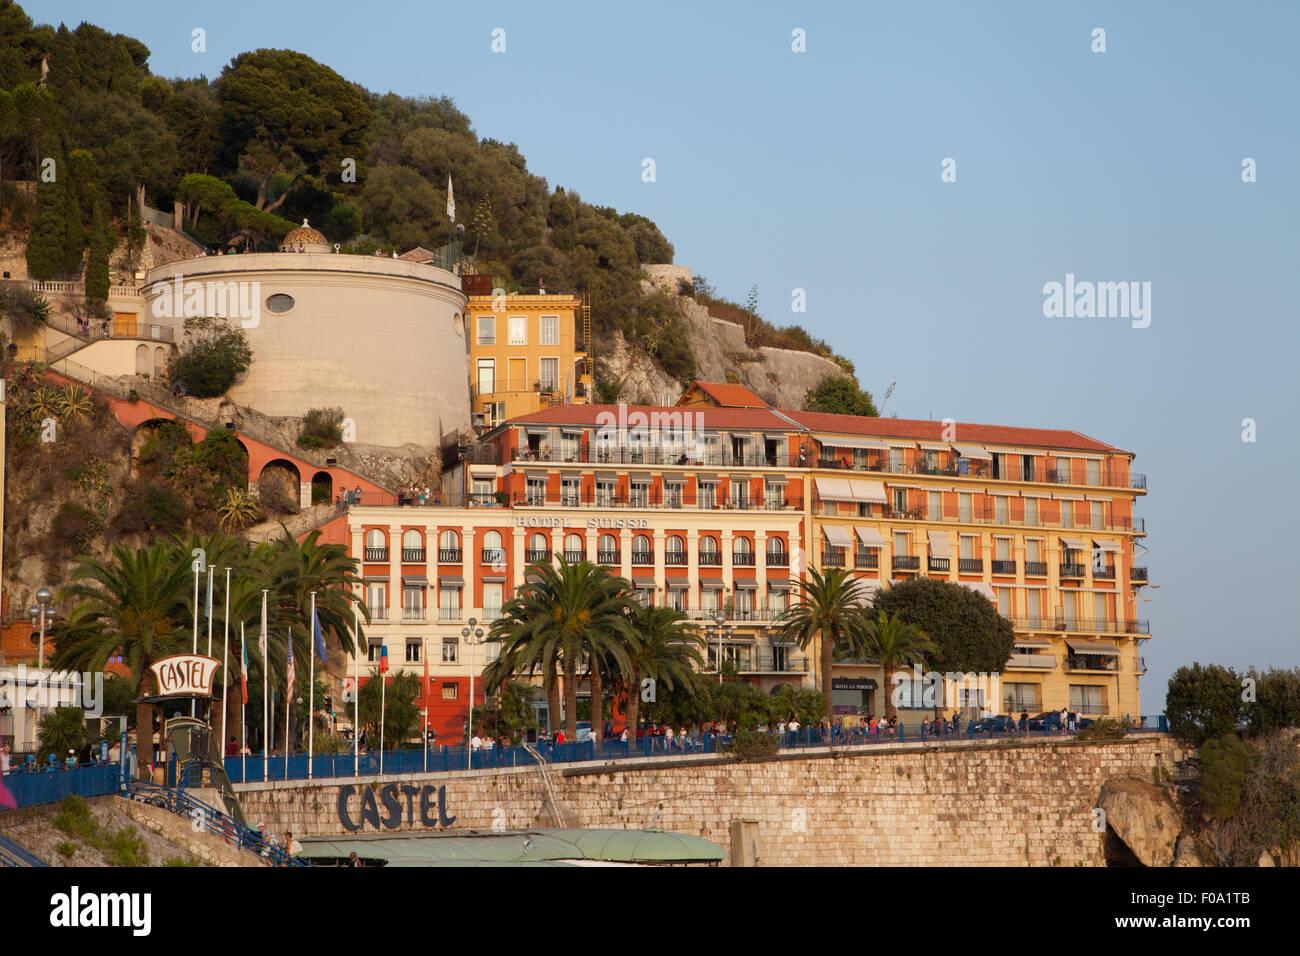 Hotel Suisse, Quai Rauba Capeu, Promenade Des Anglais, Nice, Alpes-Maritim, France. Stock Photo